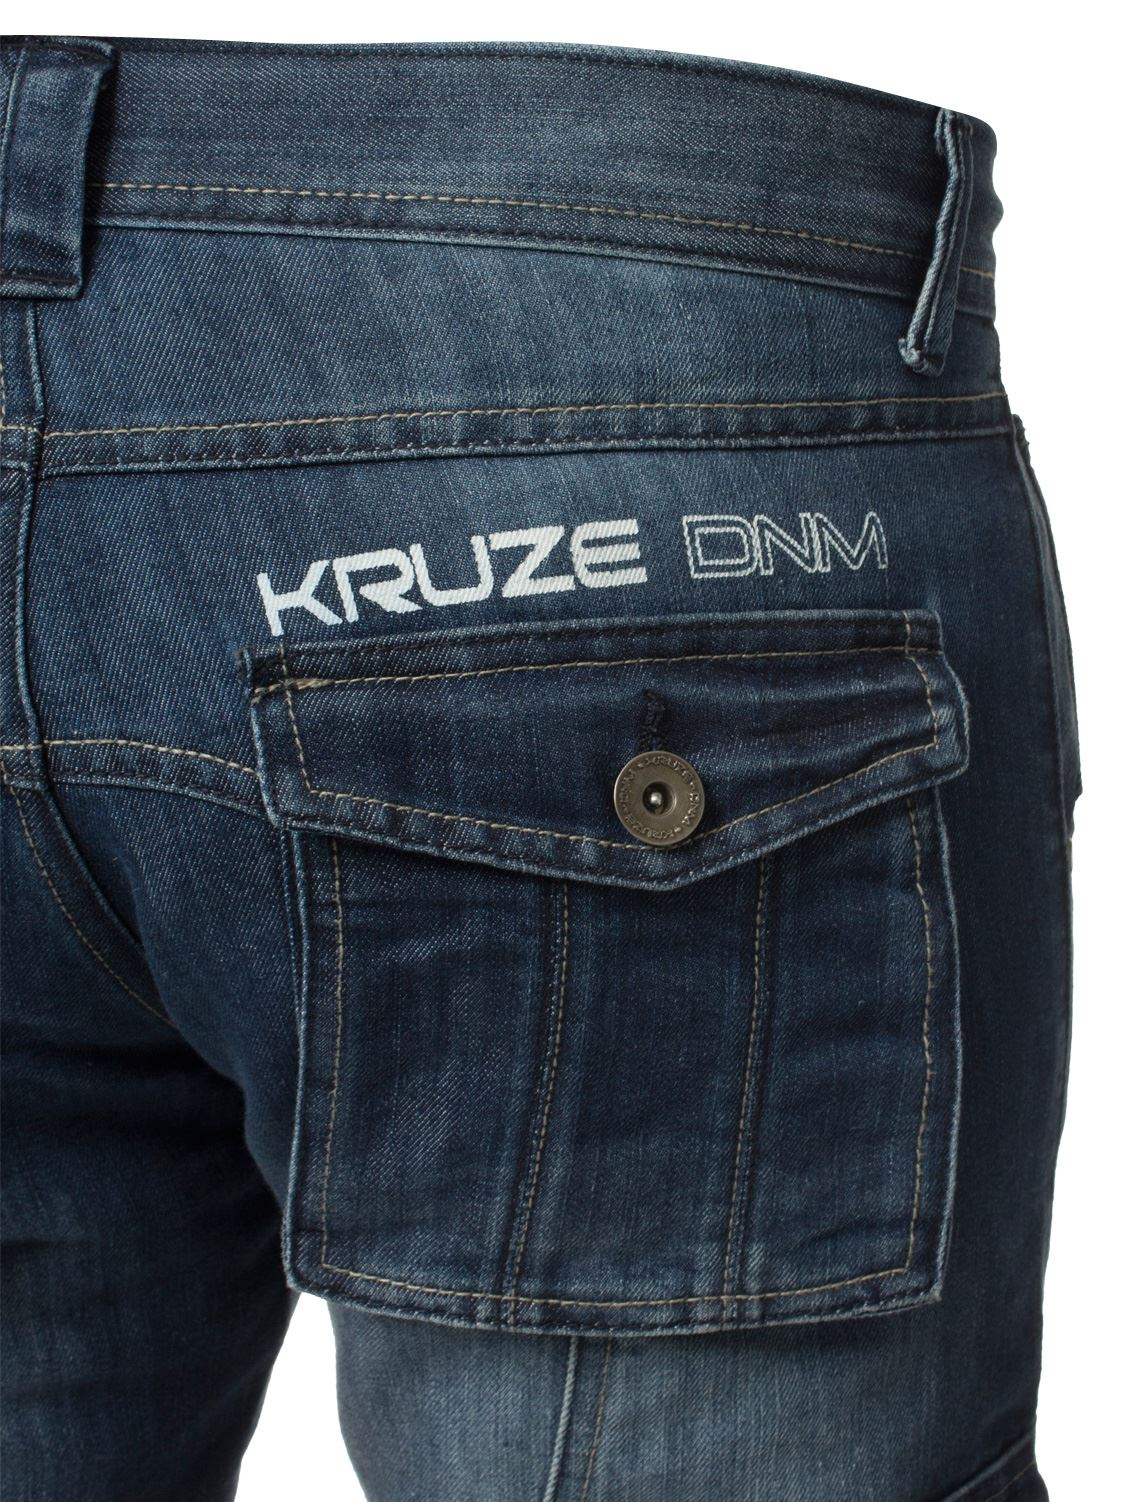 Grandes-jeans-para-hombre-de-combate-de-Kruze-Rey-Alto-Pierna-Cargo-Pantalones-Jeans-Pantalones miniatura 9